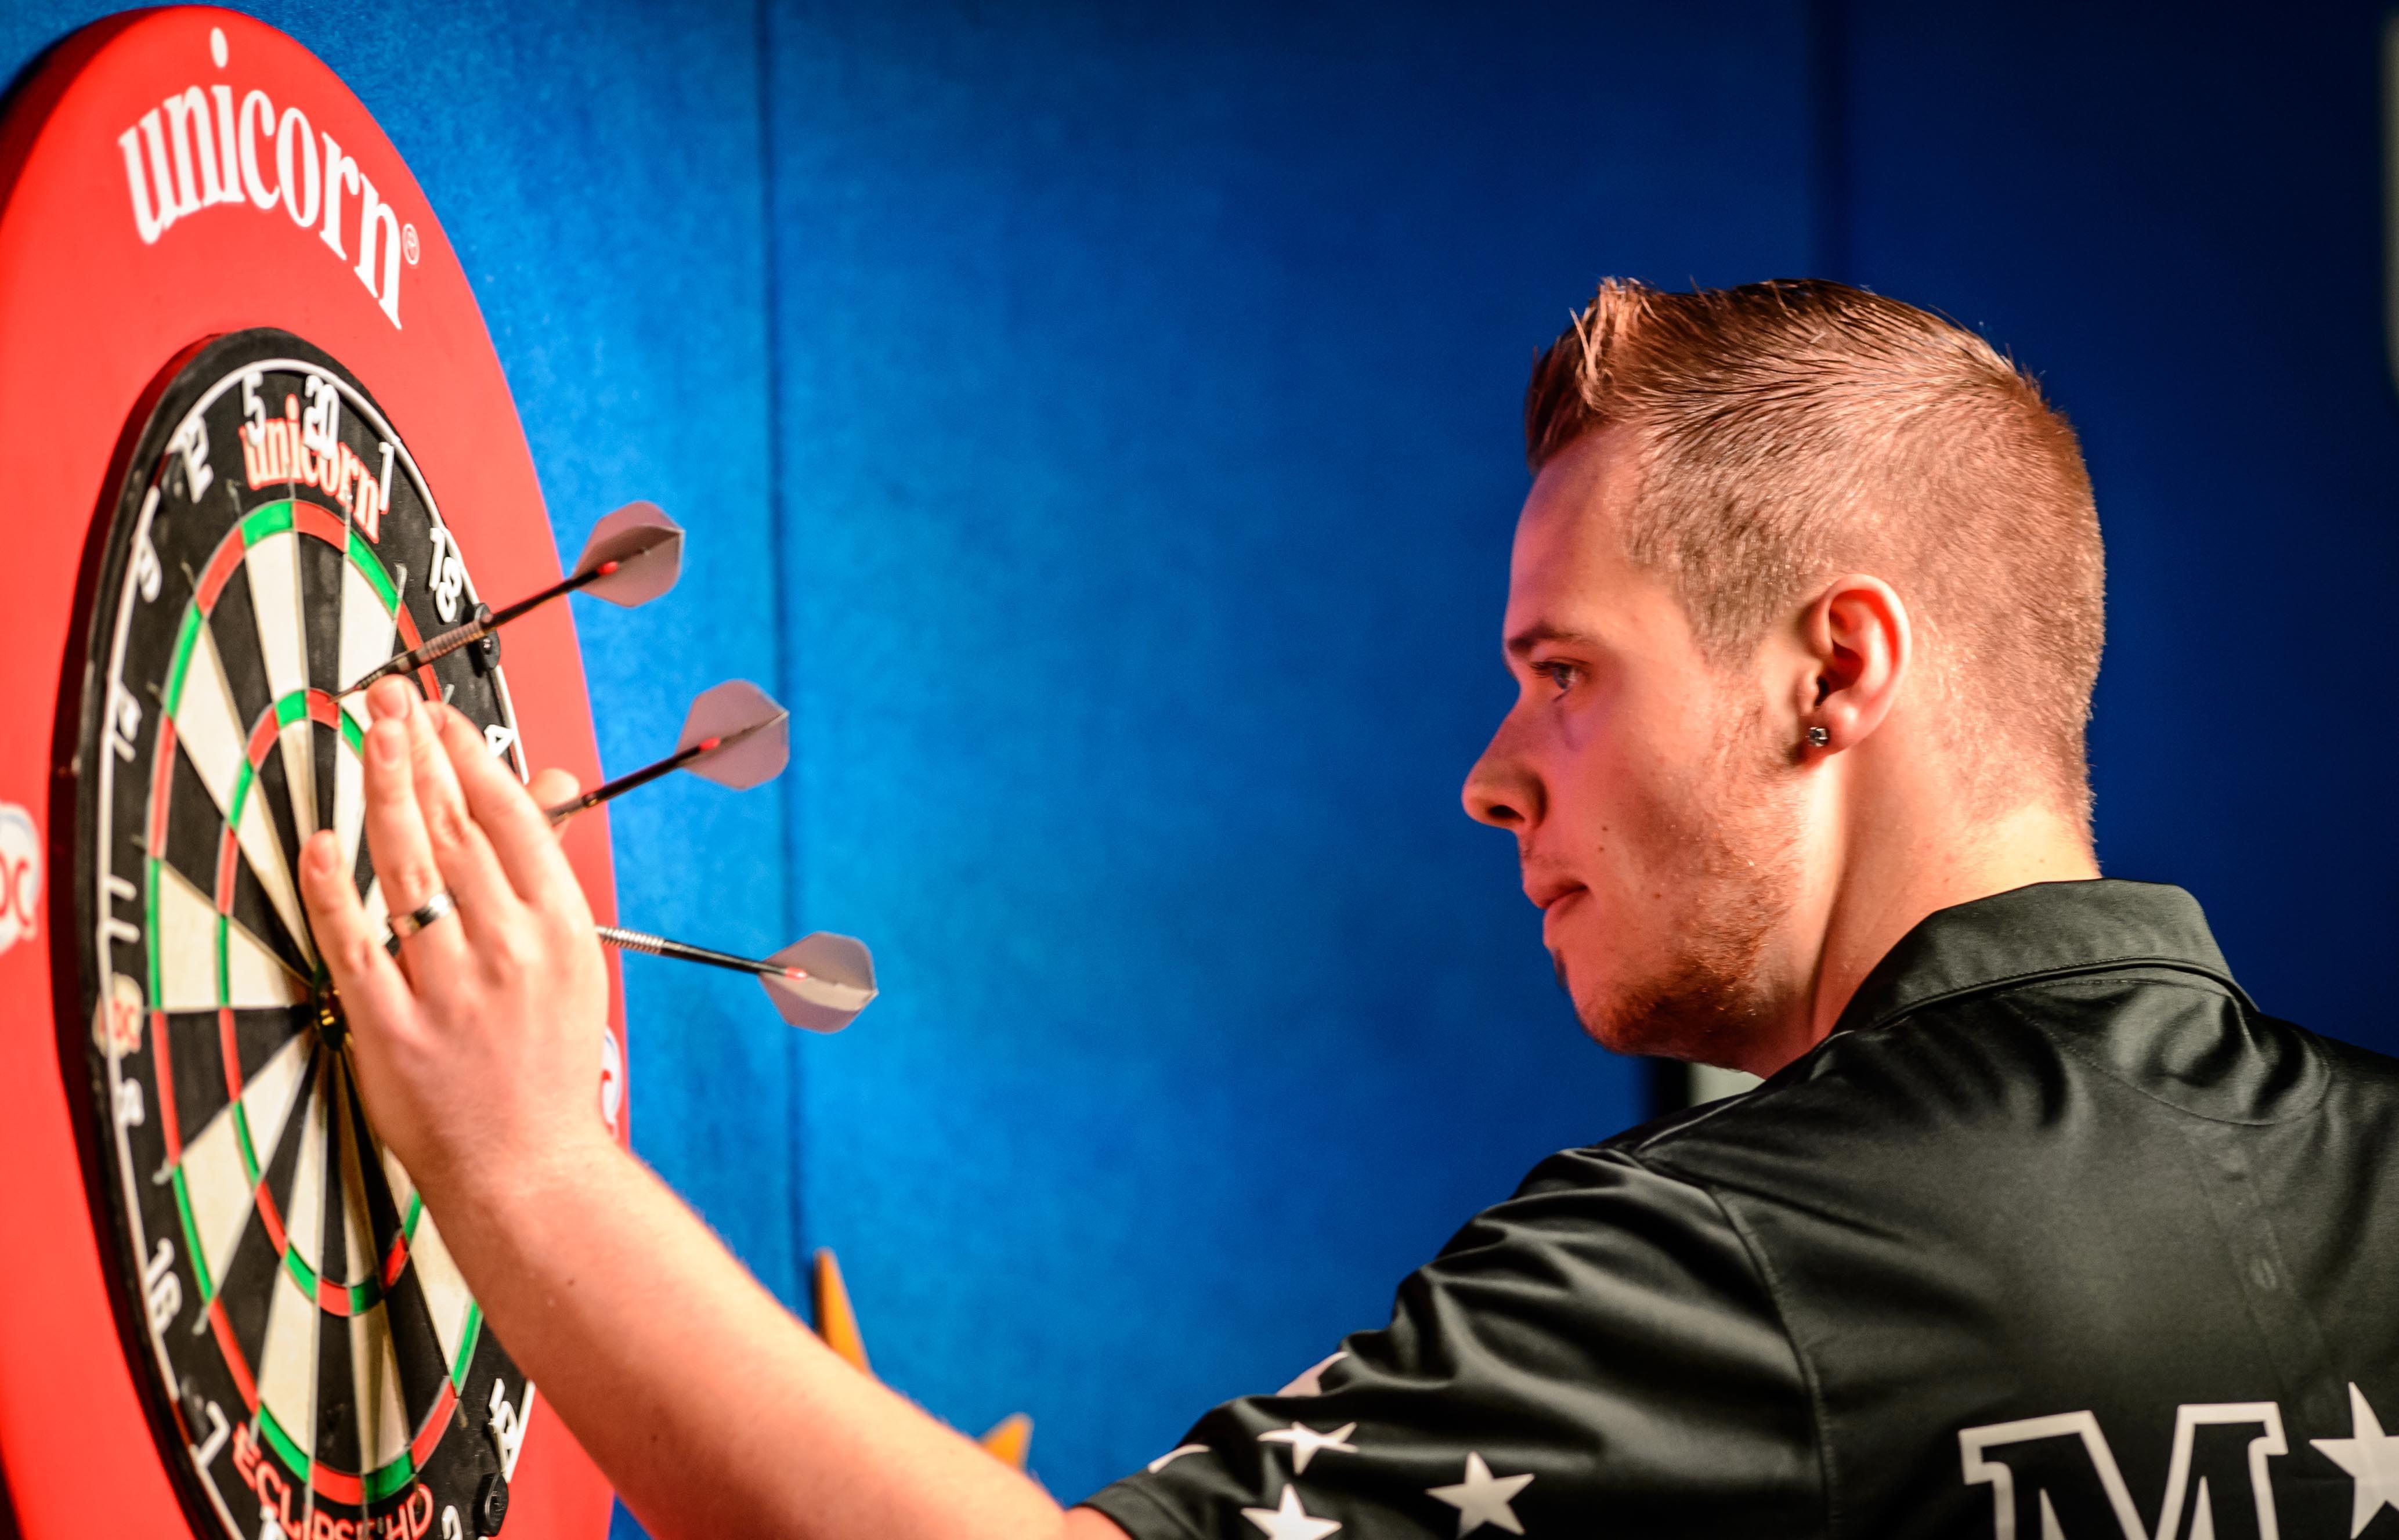 Deutsches Darts-Duo verpasst WM-Coup - Niederlande gewinnen